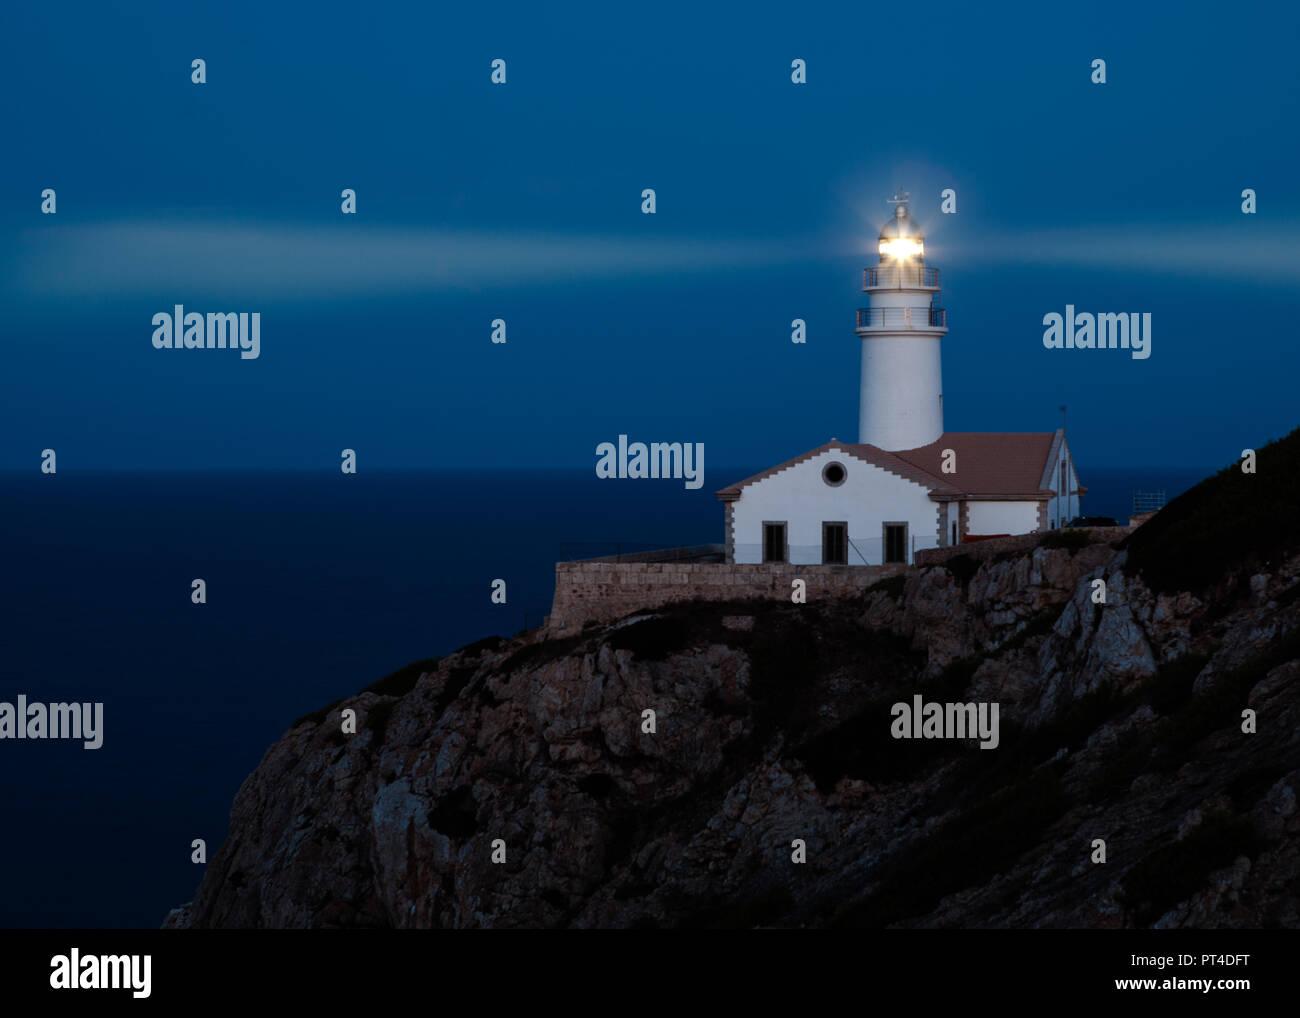 Leuchtturm von Capdepera in Cala Ratjada, Mallorca, Balearen, Spanien, Europa bei Nacht mit Leuchtstrahlen - Stock Image